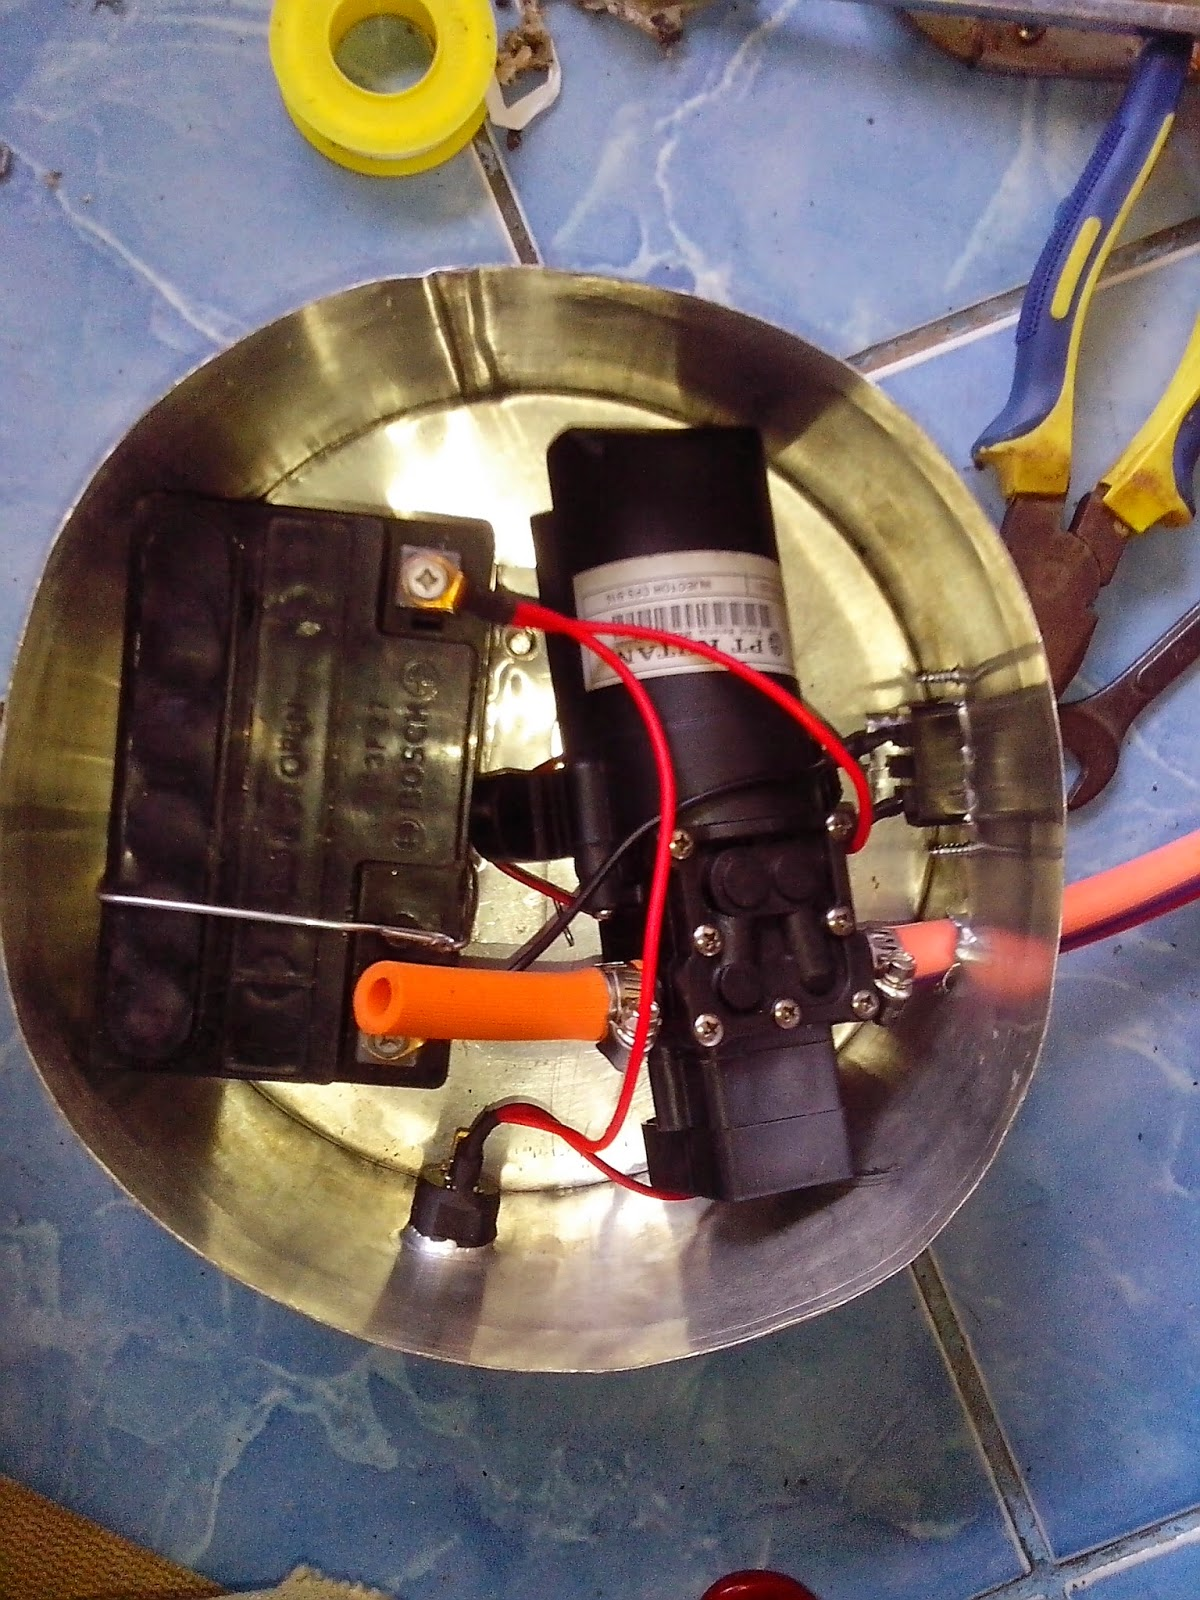 Suku Cadang Alat Semprot Elektrik Listrik (Semprot Pompa Manual jadi Elektrik)